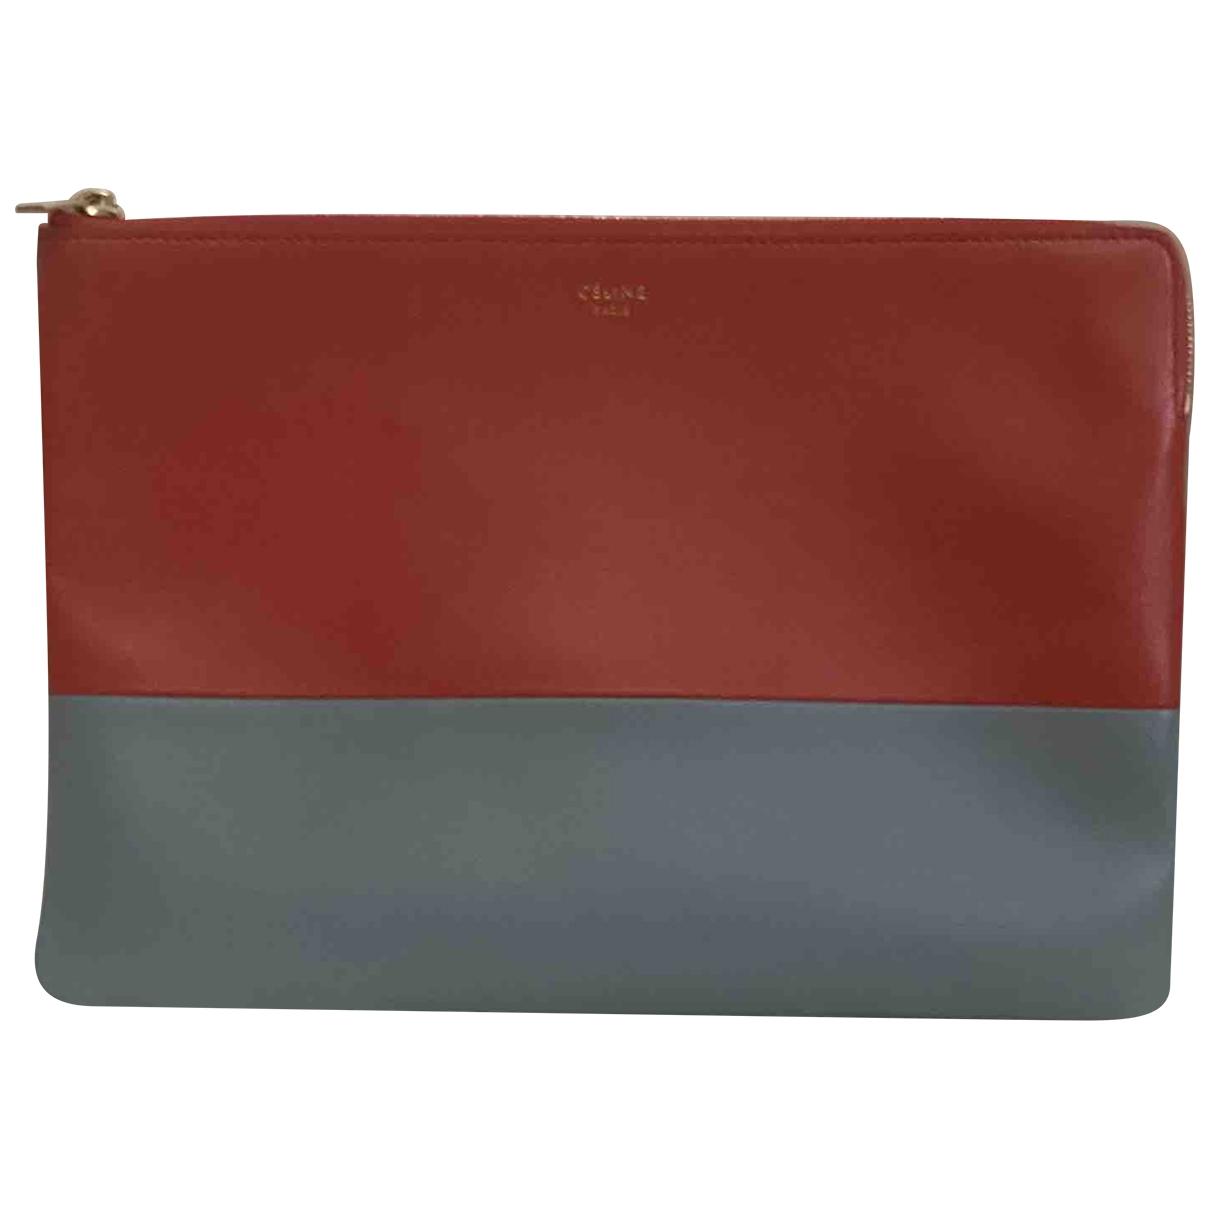 Celine \N Orange Leather Clutch bag for Women \N